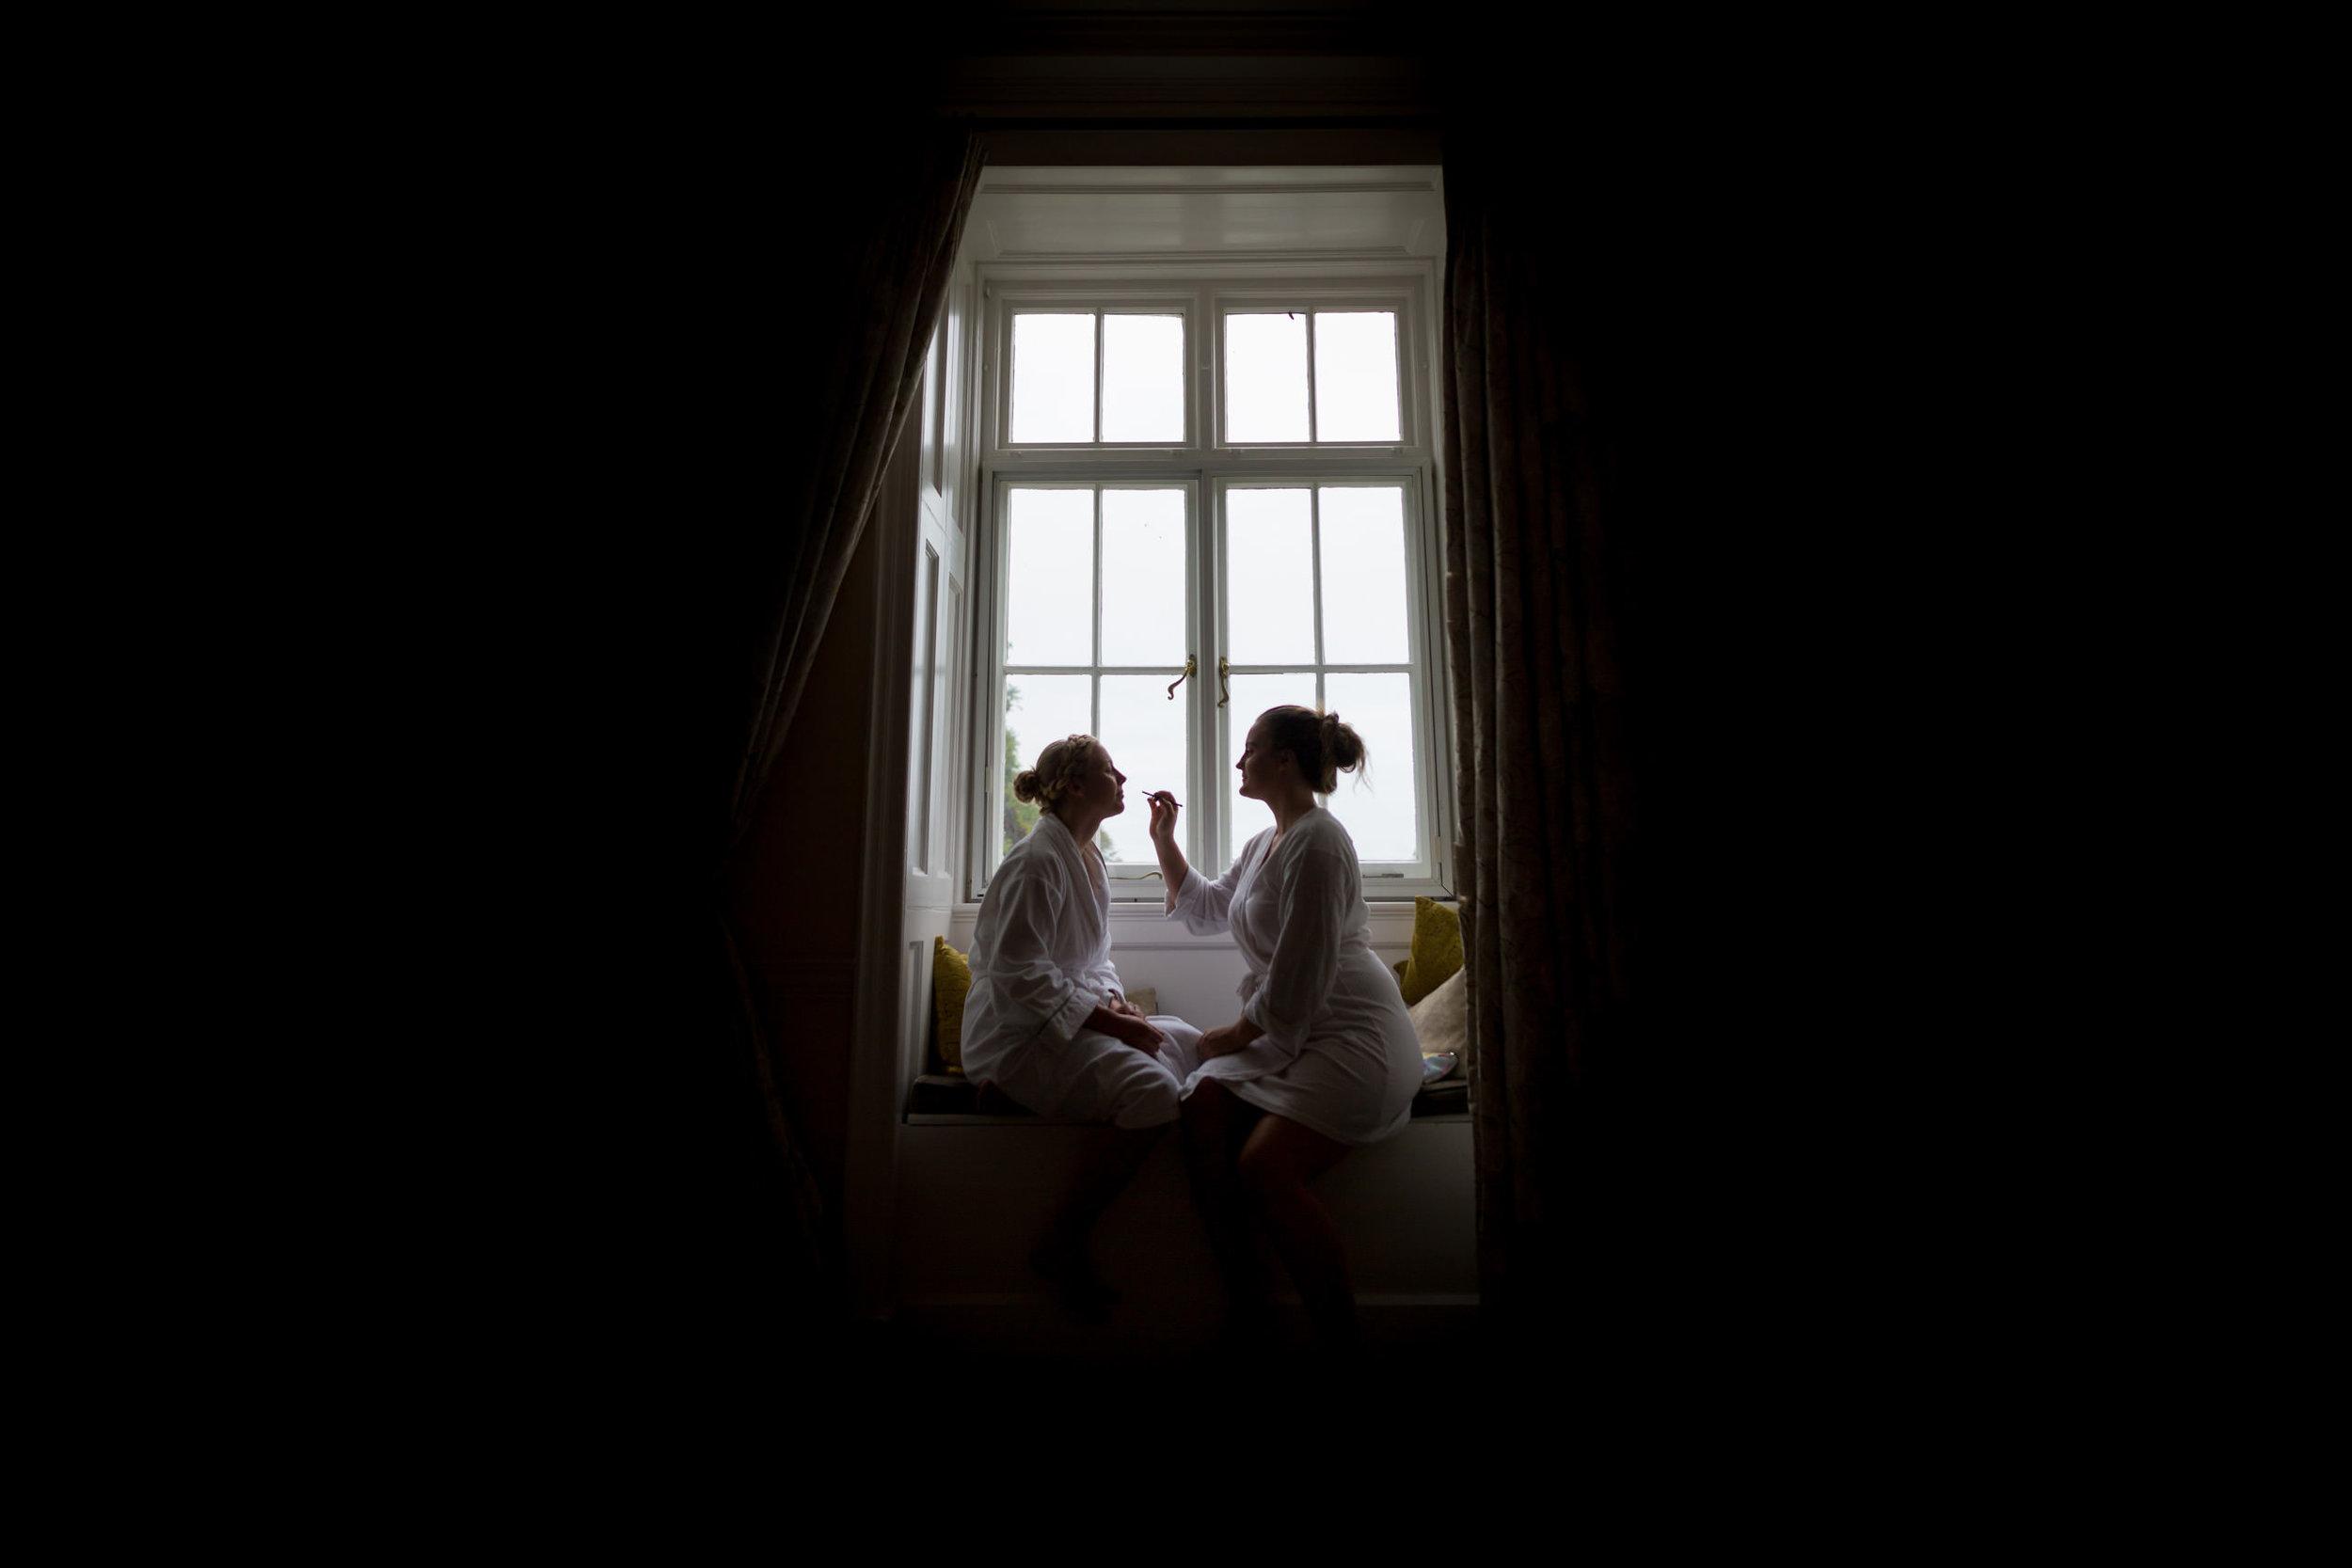 Bucklands-Tout-Saints-Hotel-Devon-Wedding-Photography-1-2.jpg